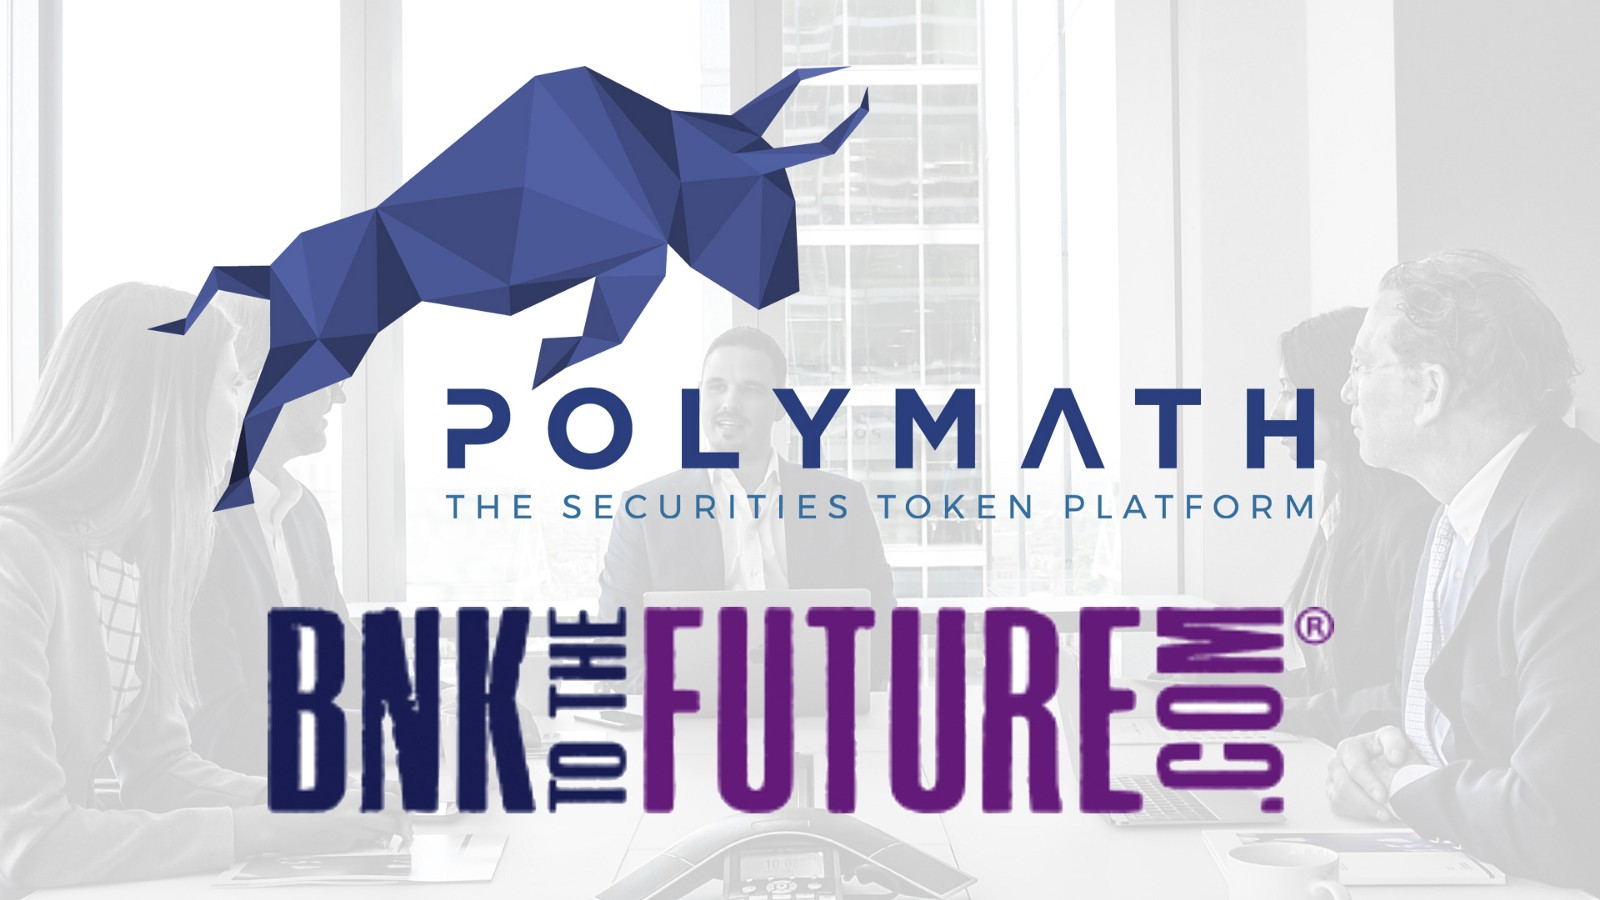 Polymath and BnkToTheFuture.com creating security token babies